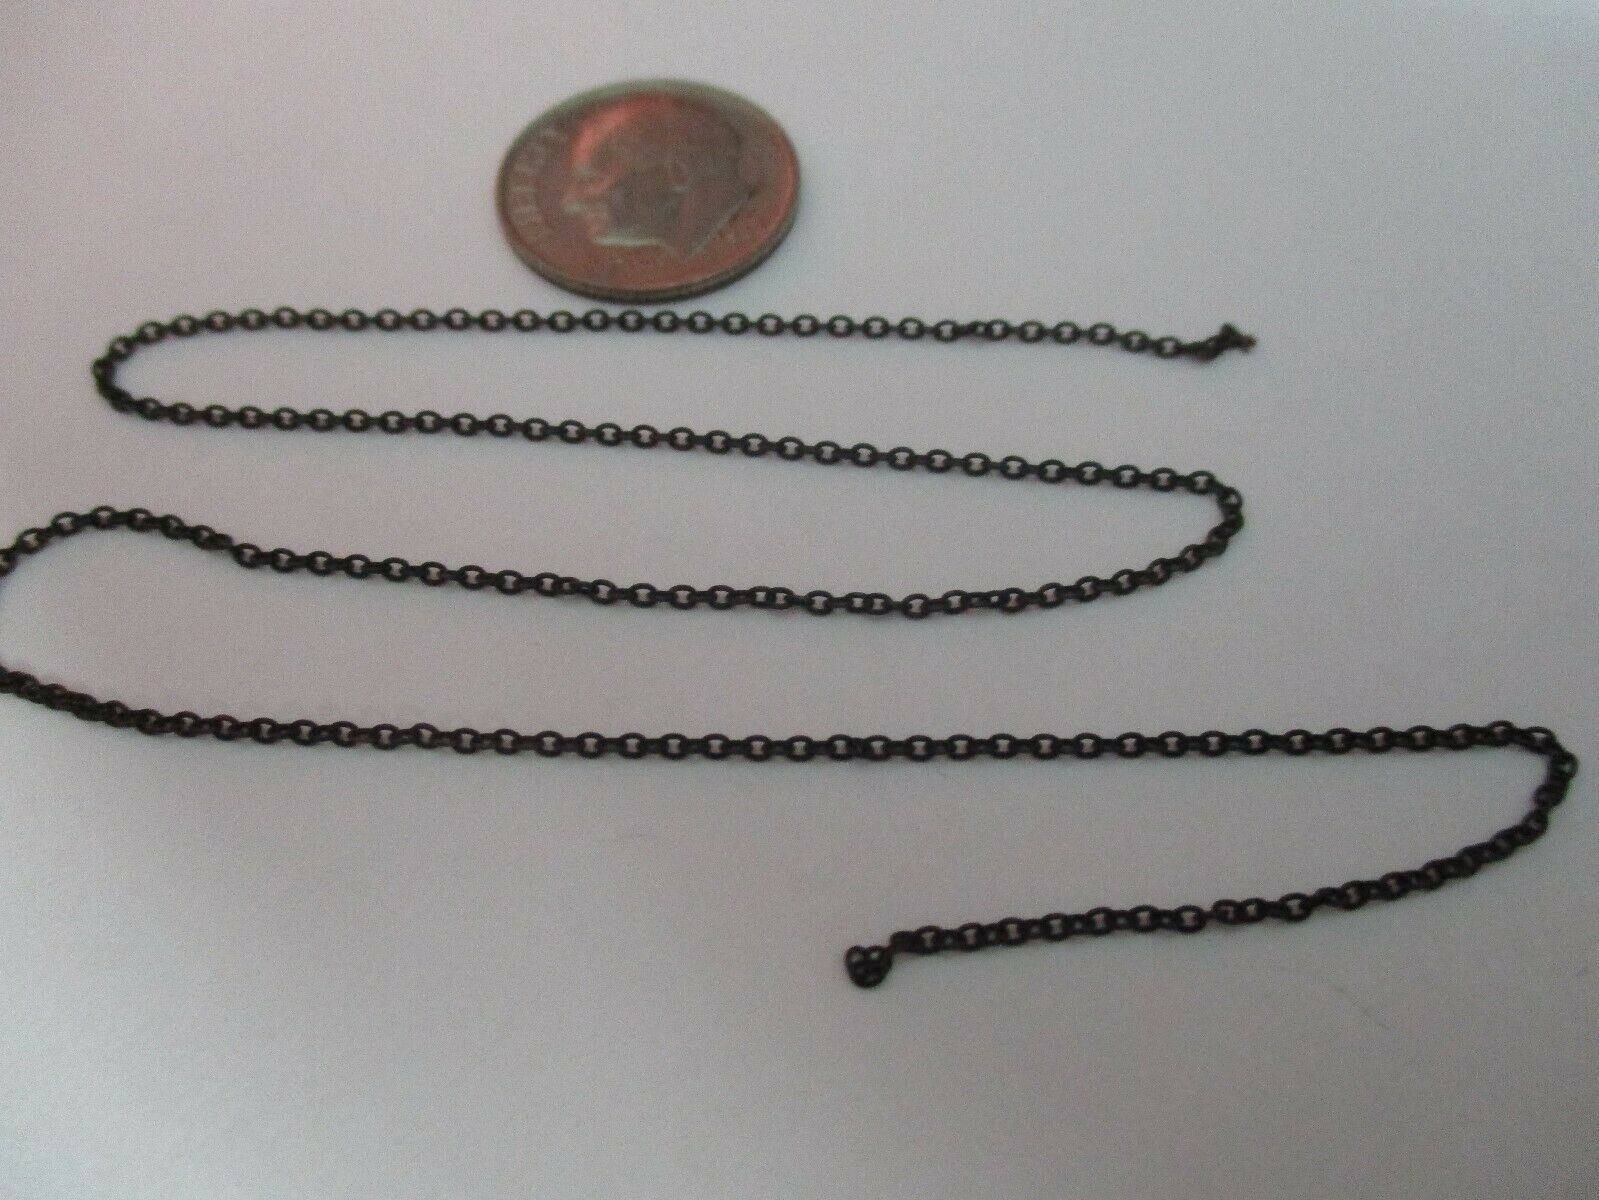 "A-Line #29220 Black Chain 12"" - 27 Links per inch"